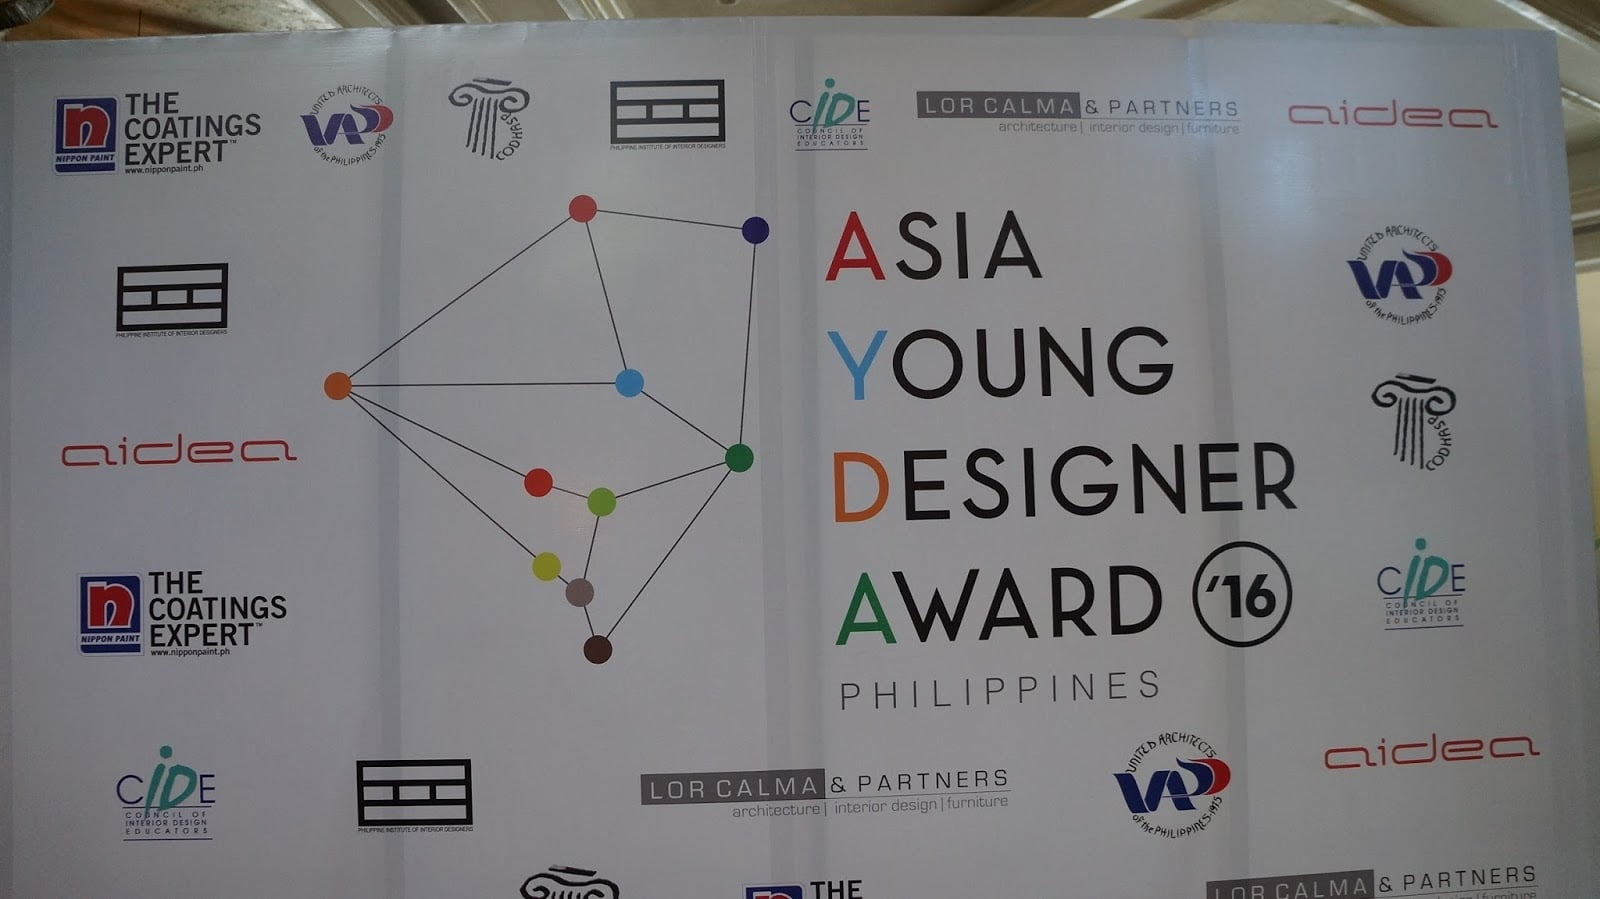 The Asia Young Designer Award 2016